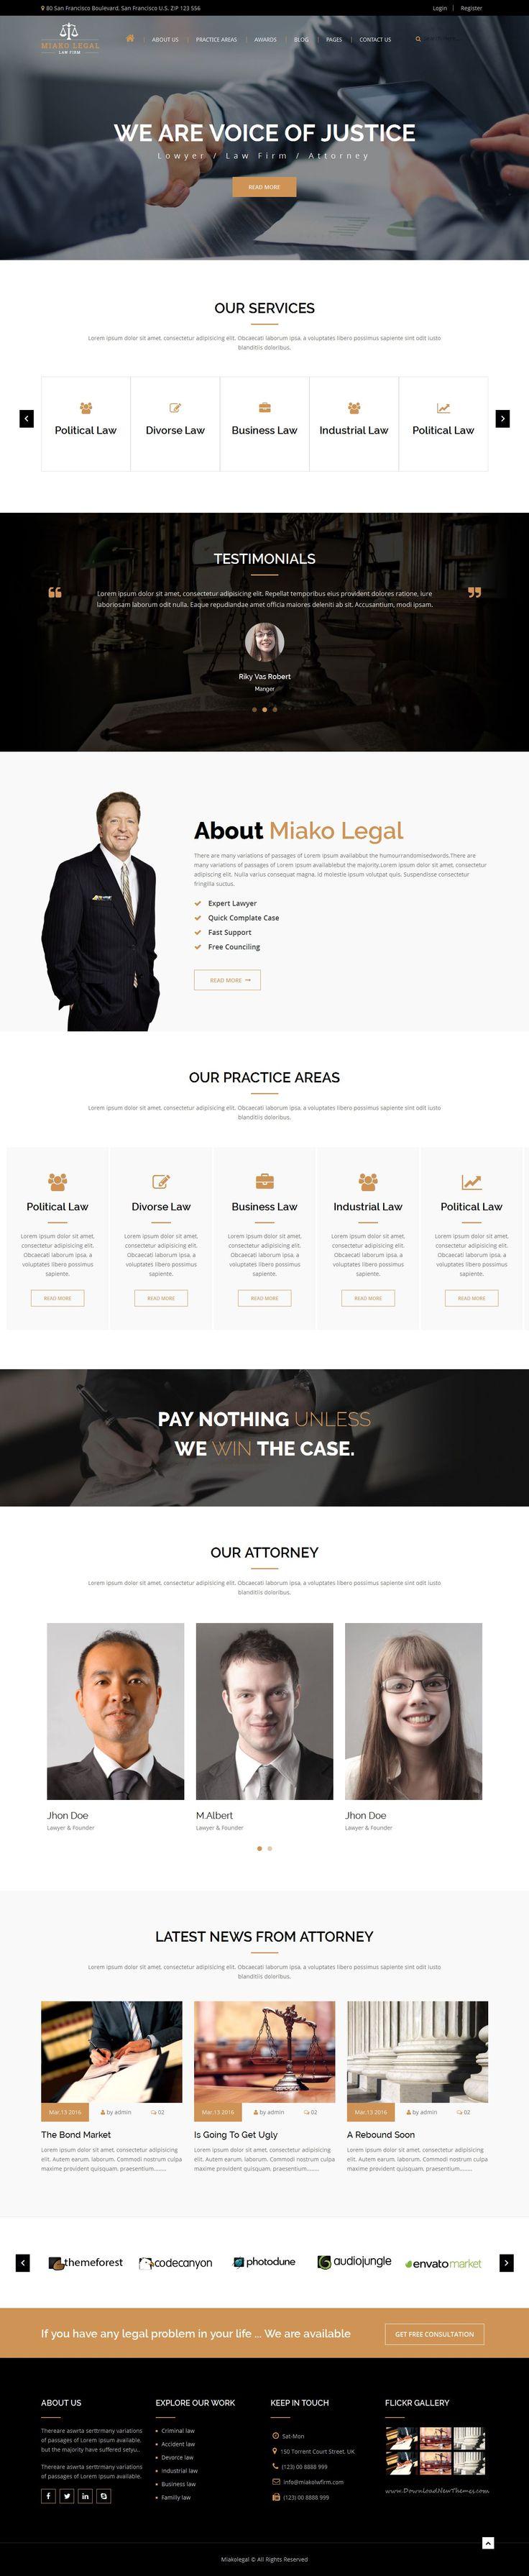 Miako Legal Law Firm Bootstrap HTML5 Template